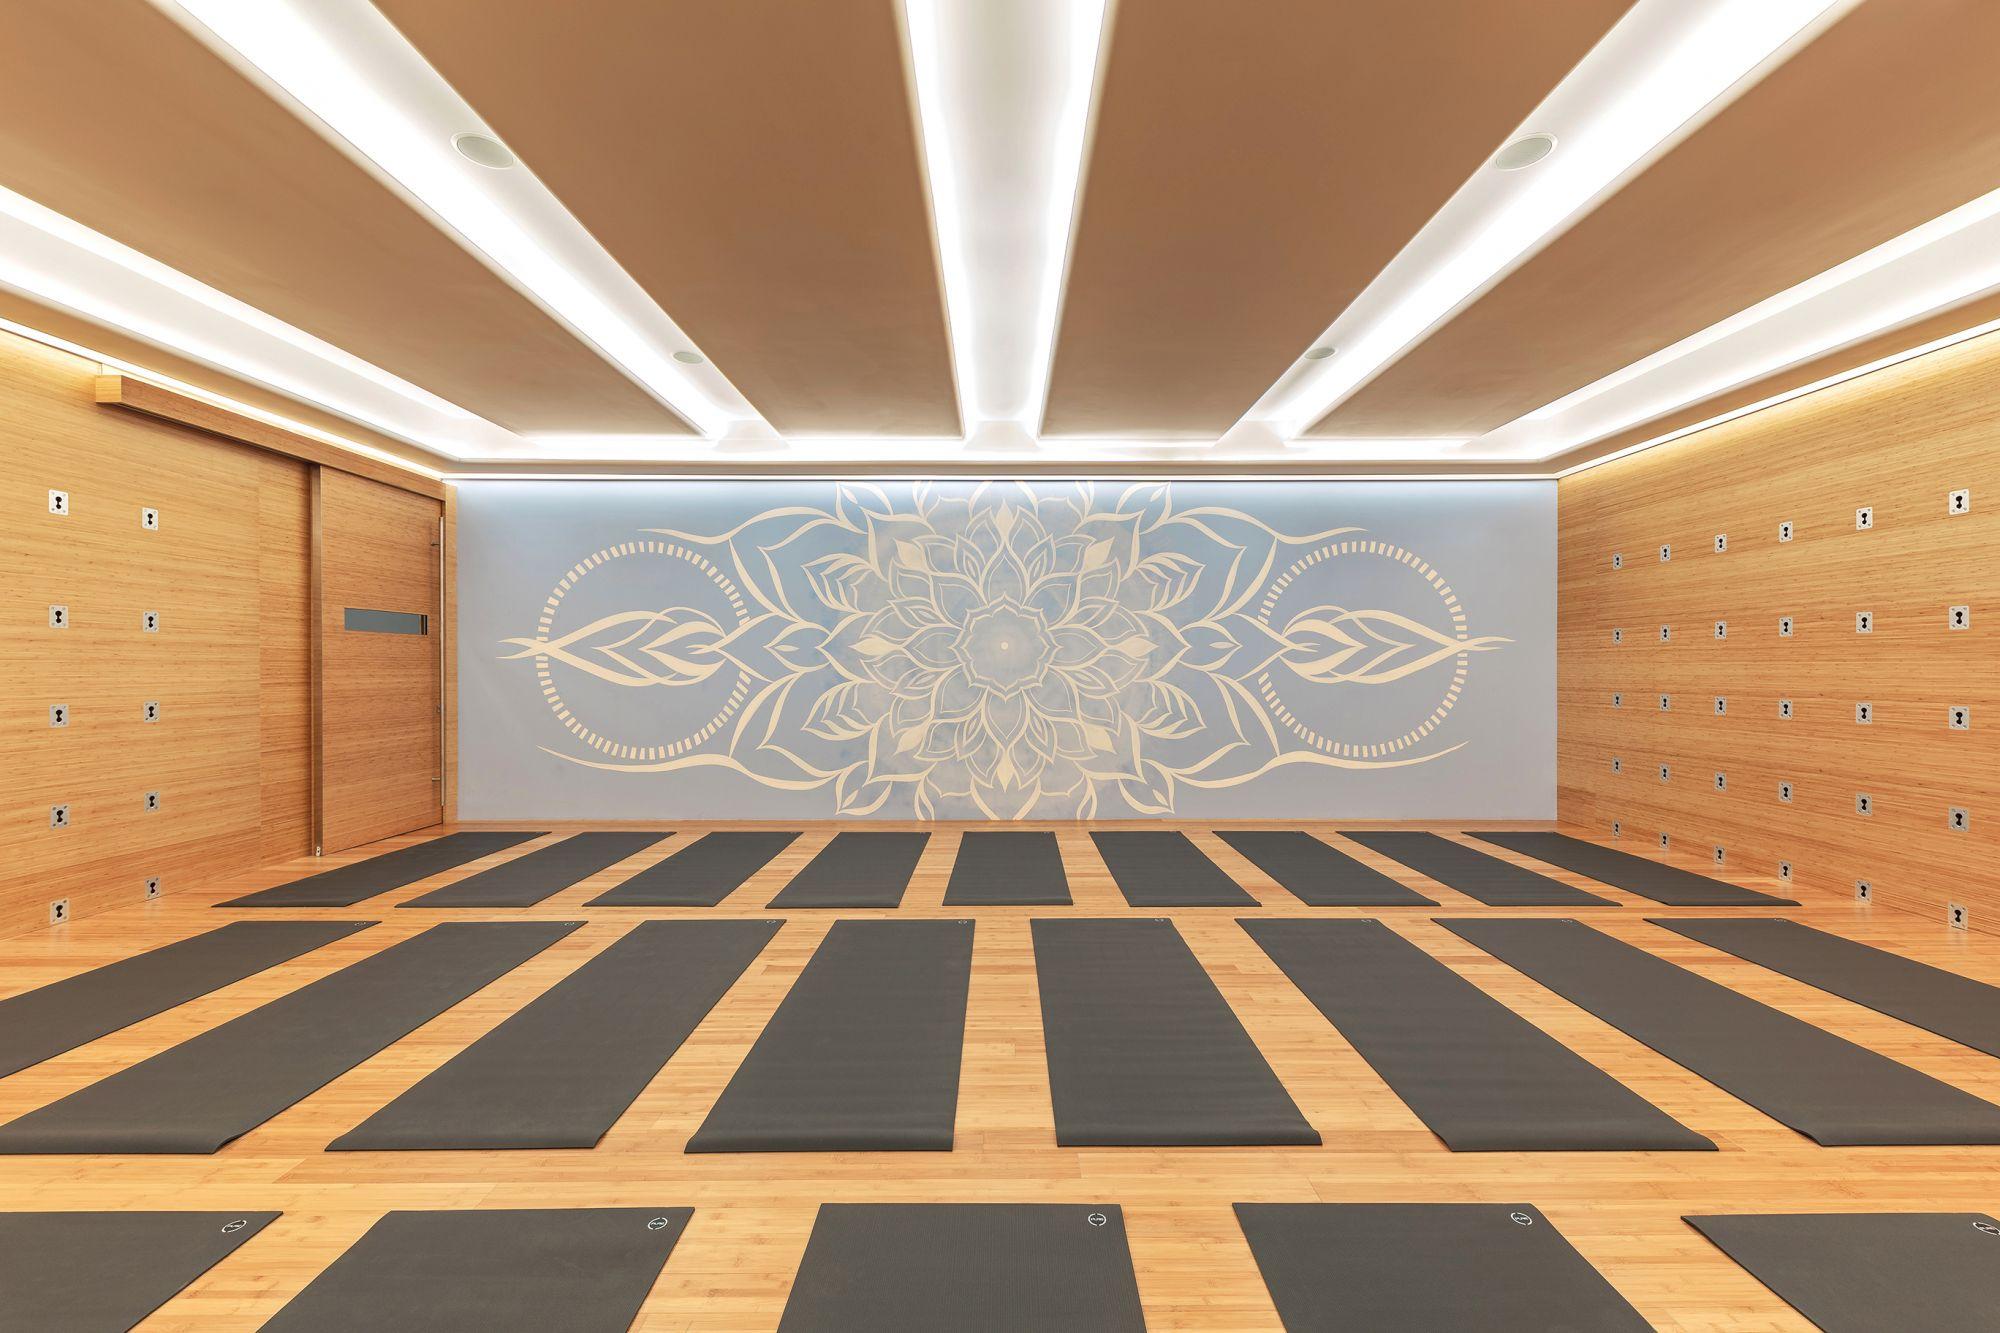 5 Luxury Yoga Studios In Singapore To Find Your Zen Tatler Singapore